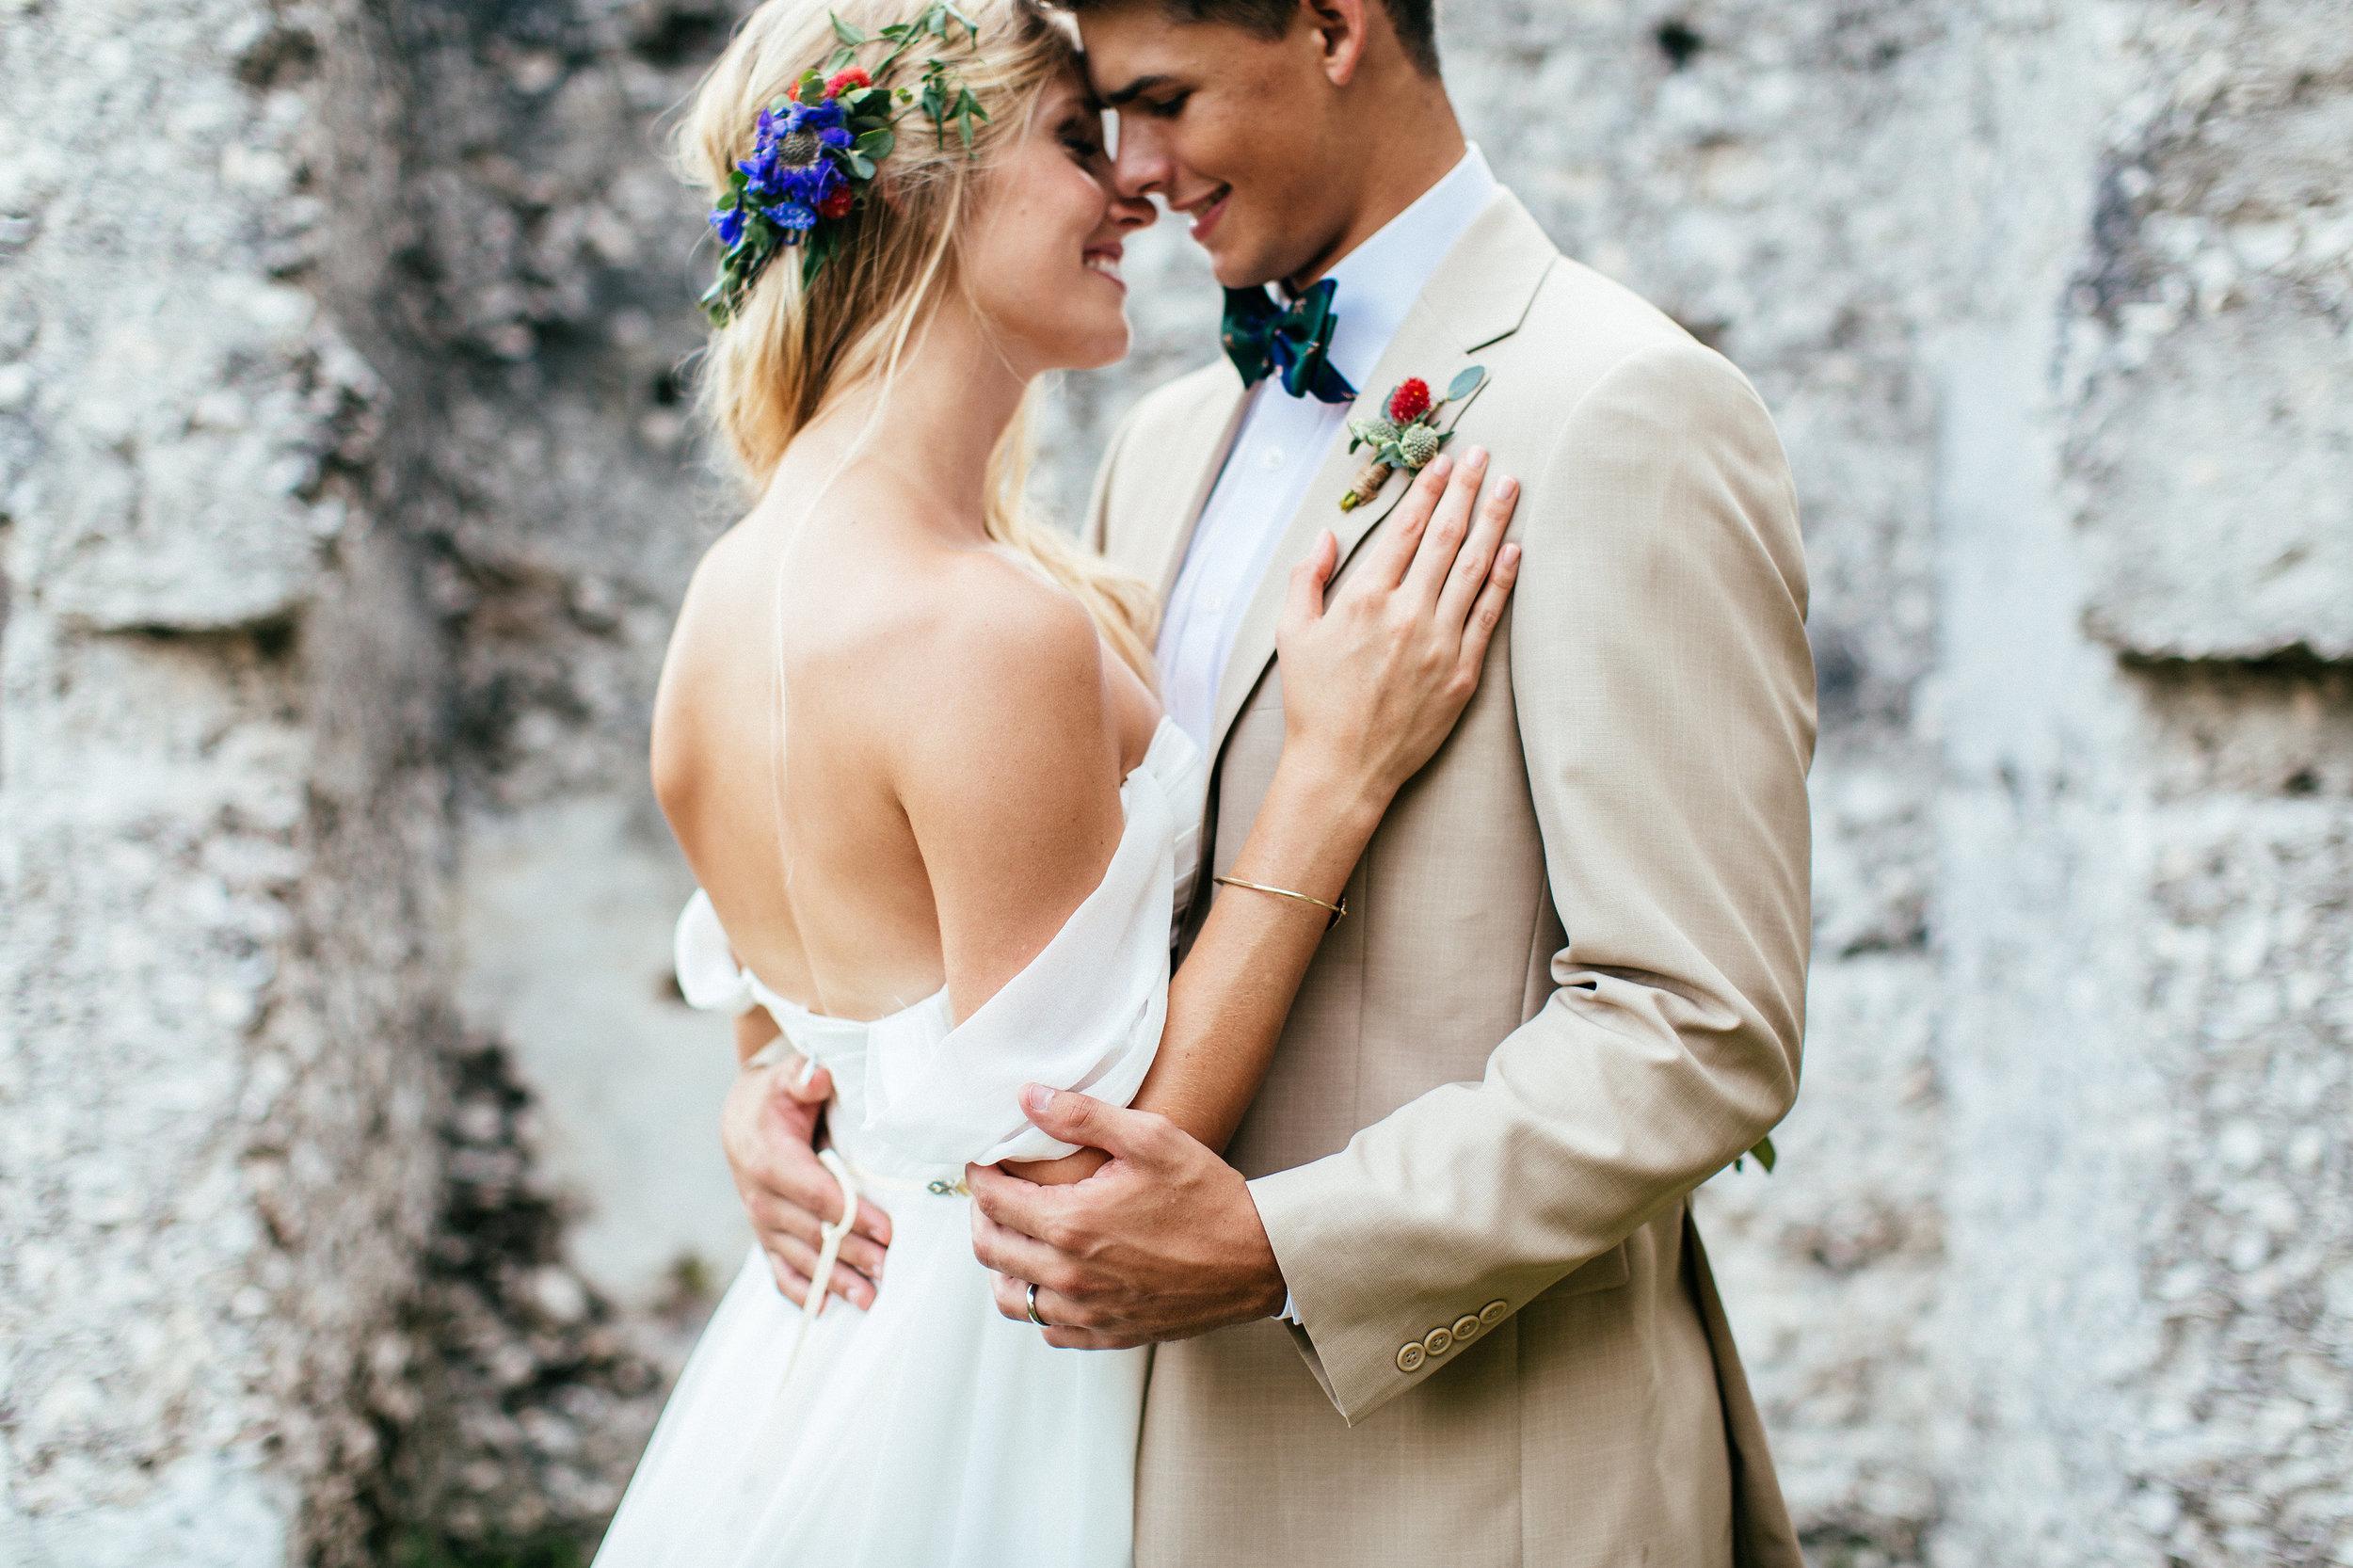 christina-karst-photography-ivory-and-beau-bridal-boutique-sarah-seven-lafayette-boho-bride-boho-bridal-boutique-indie-bridal-boutique-savannah-bridal-boutique-savannah-wedding-dresses-savannah-bridal-gowns-22.jpg